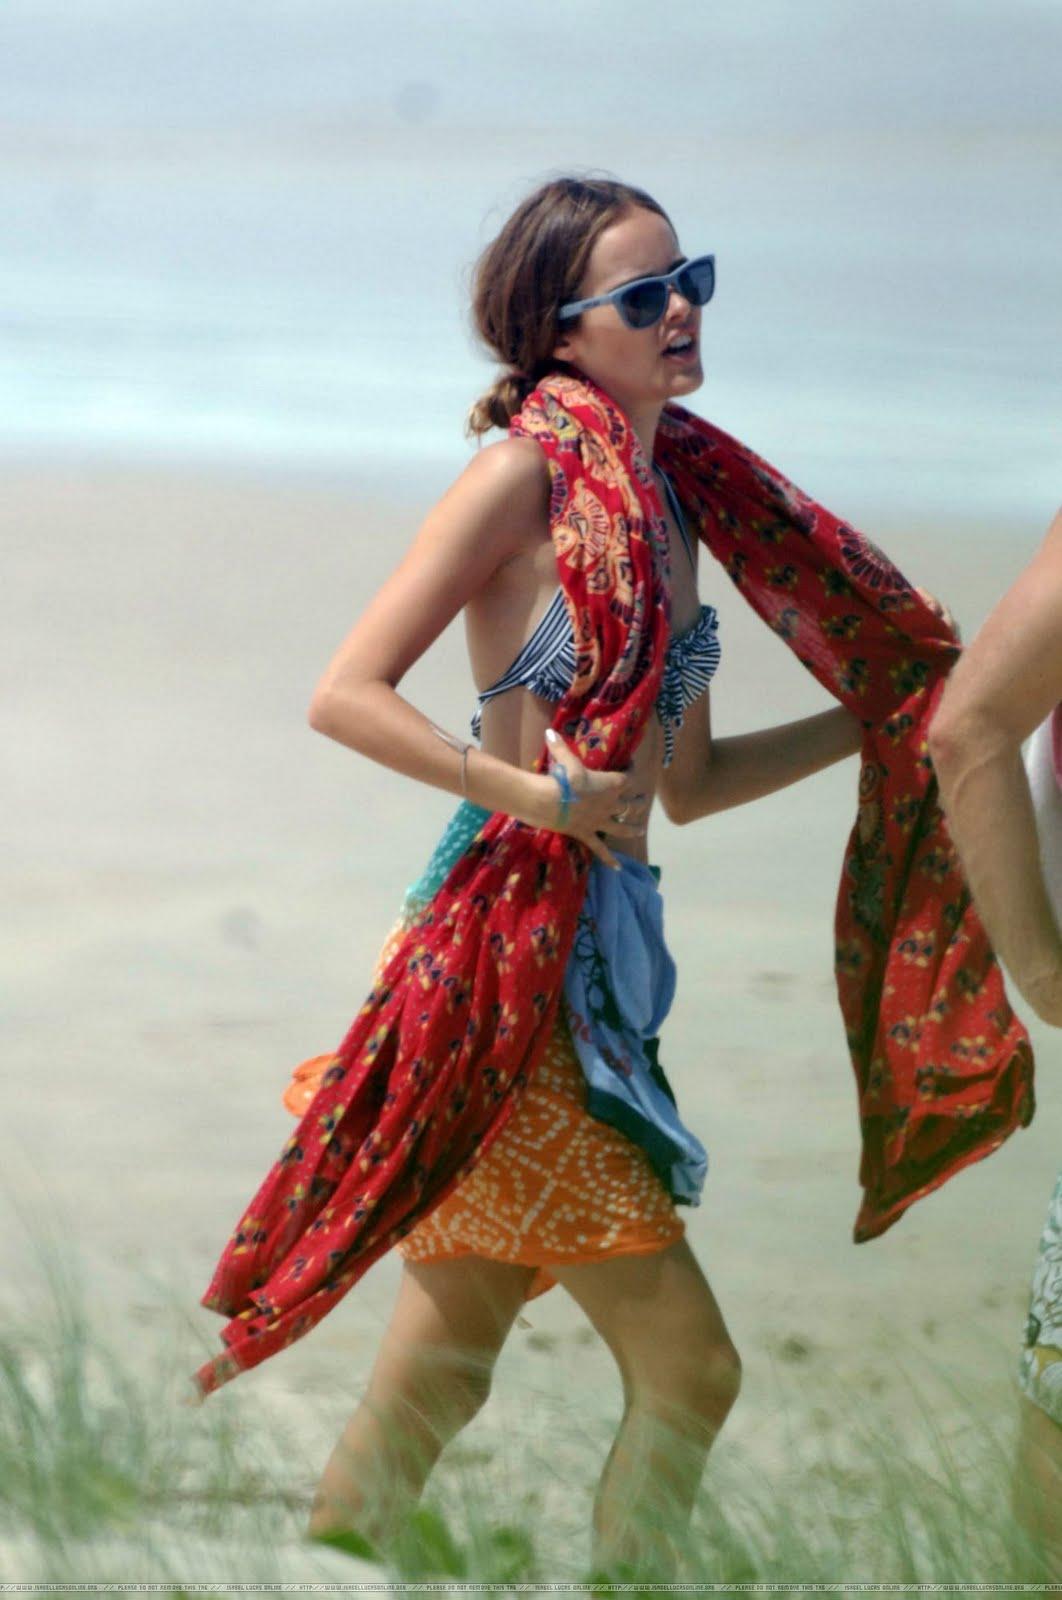 eBag Fashion | Celebrity, Royals, Entertainment